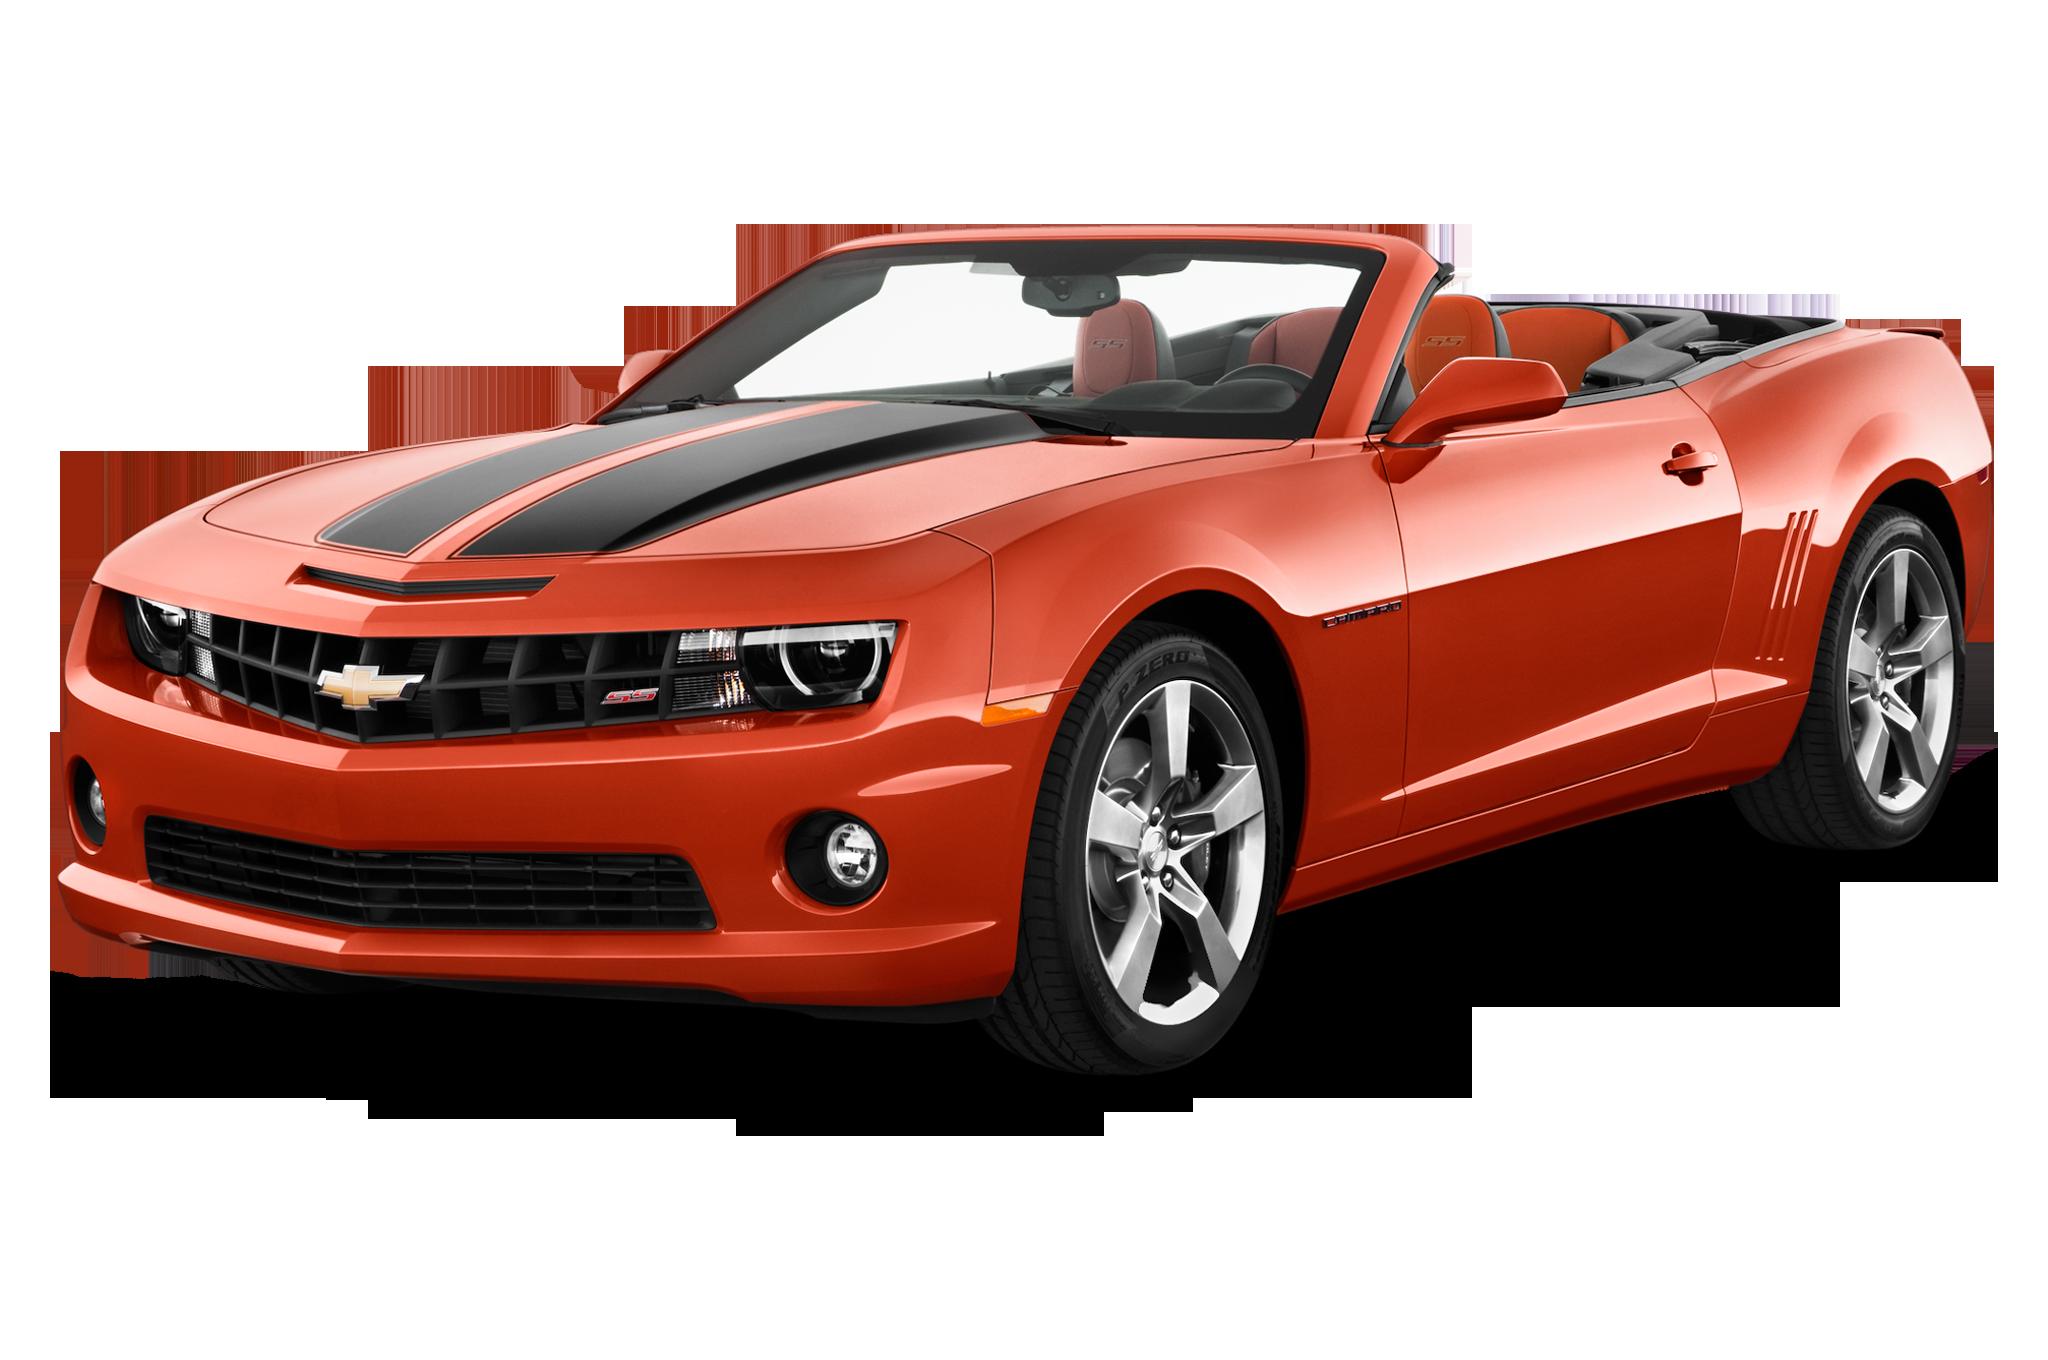 2011 Chevrolet Camaro Ss Convertible Driven Automobile